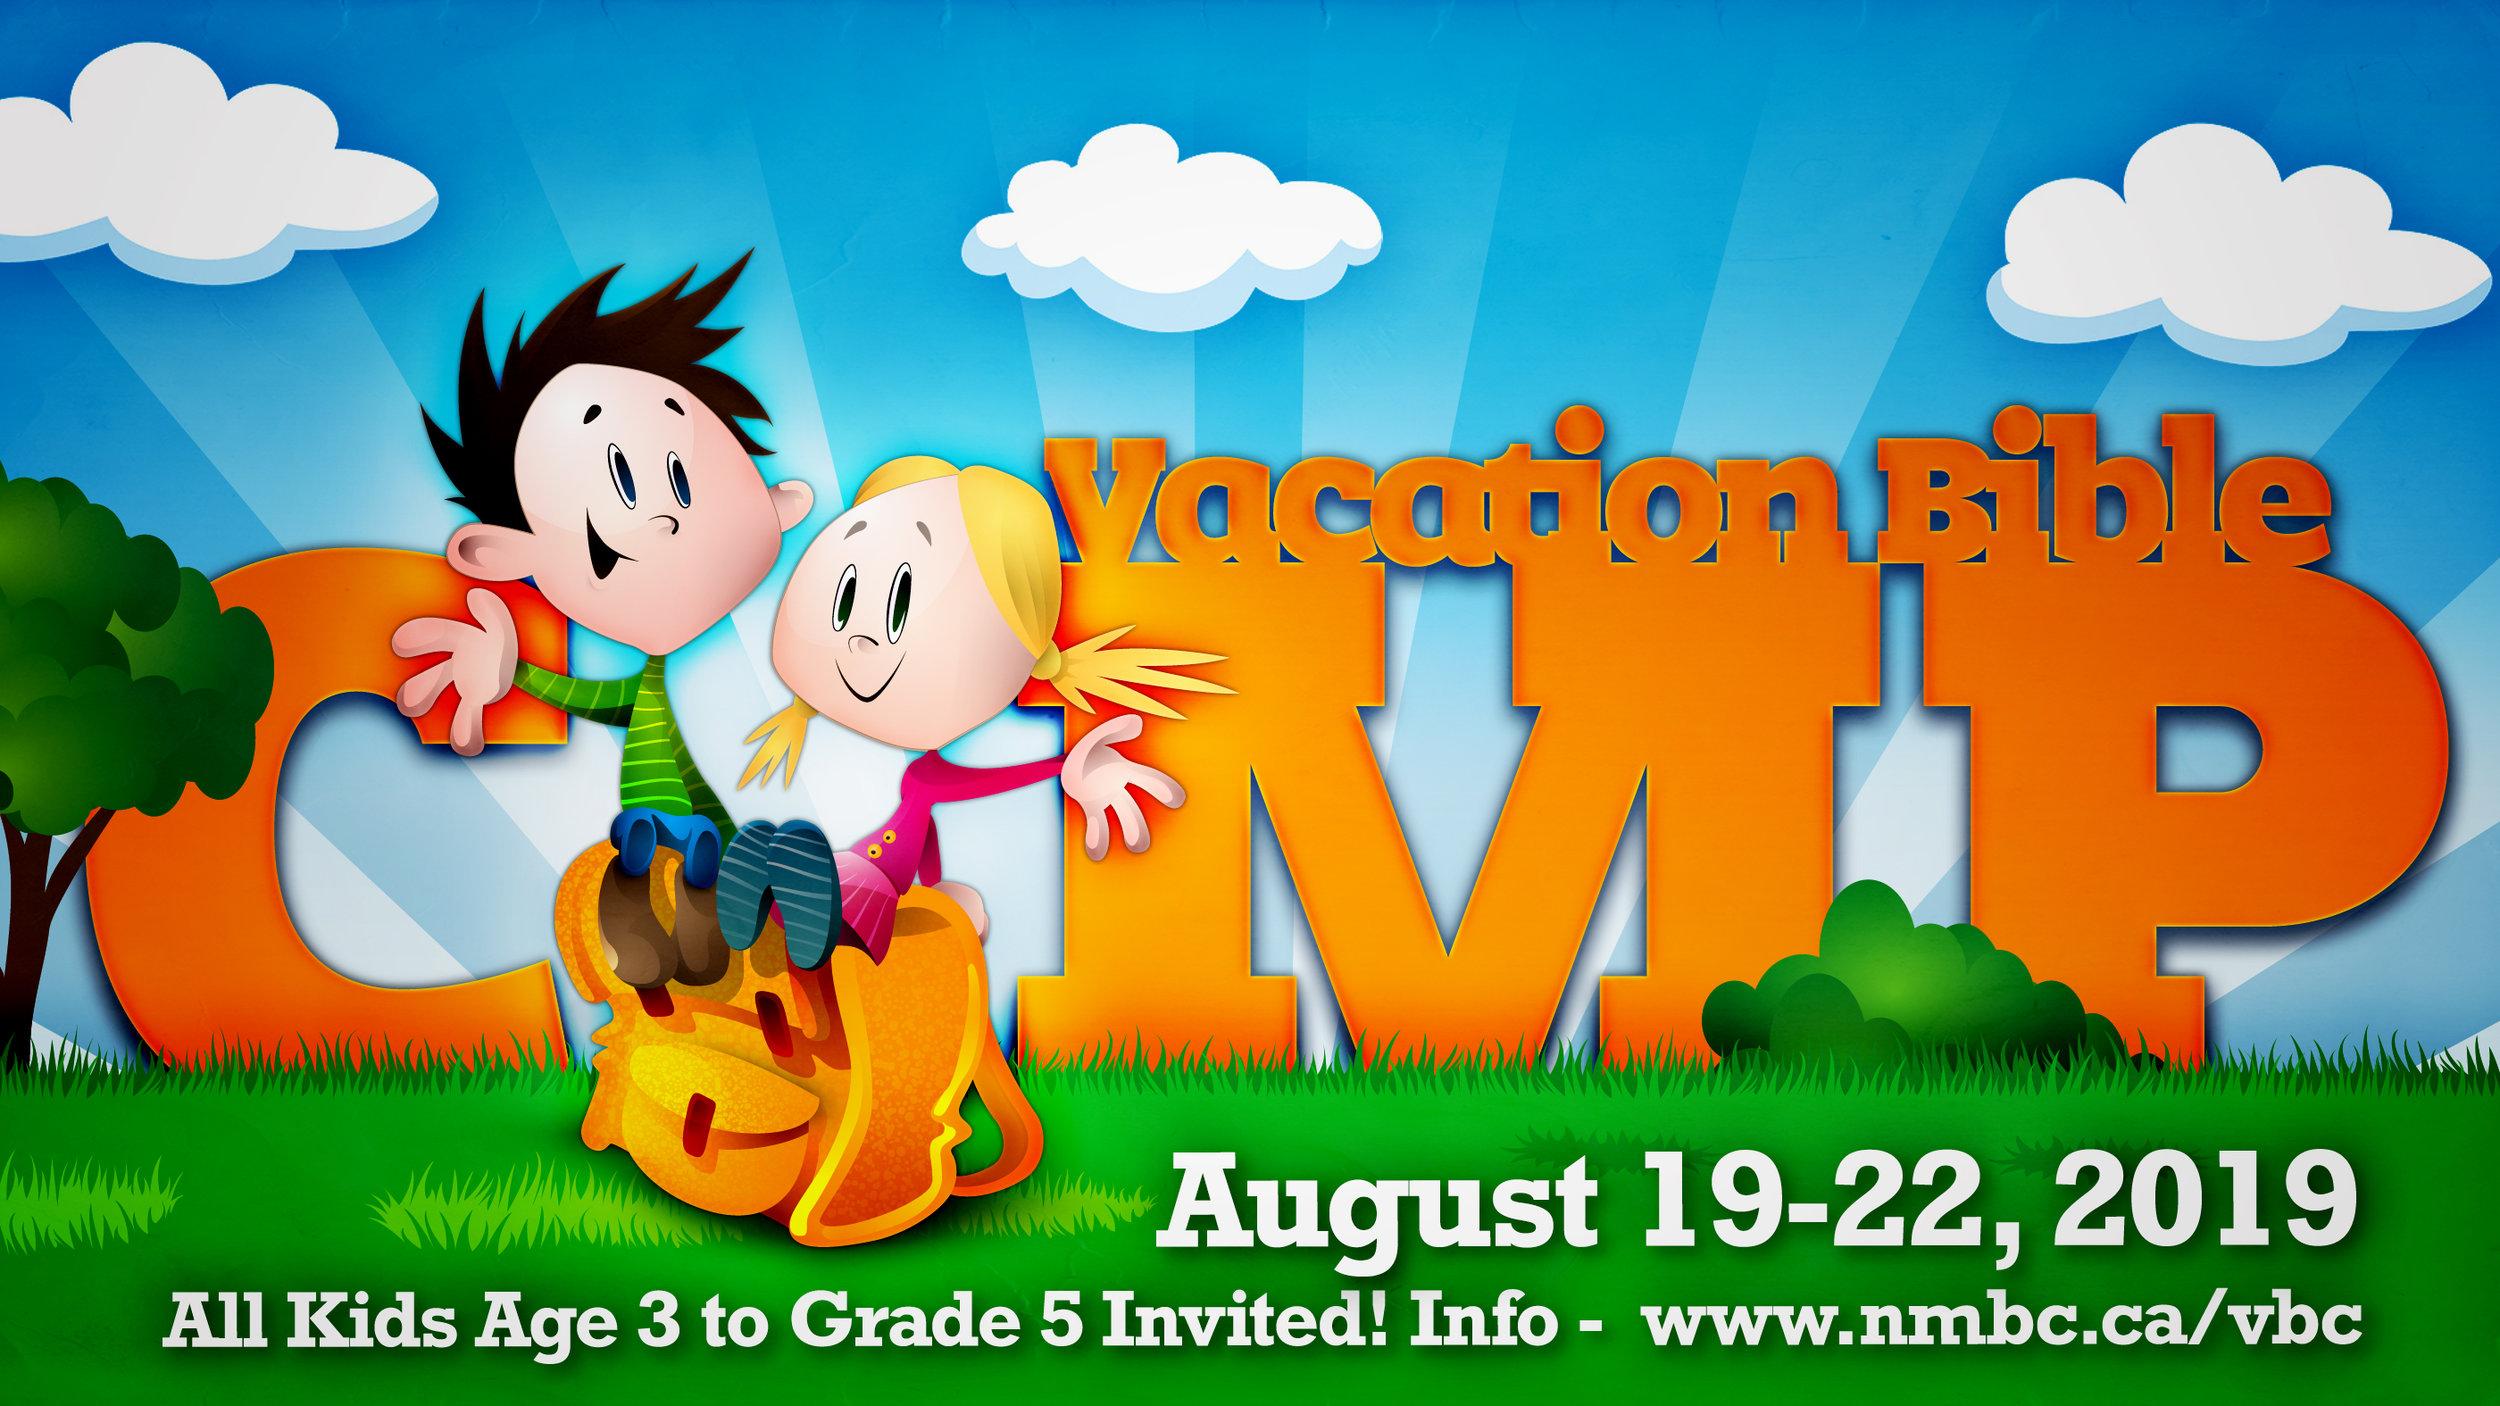 2019 Vacation Bible Camp Logo.jpg